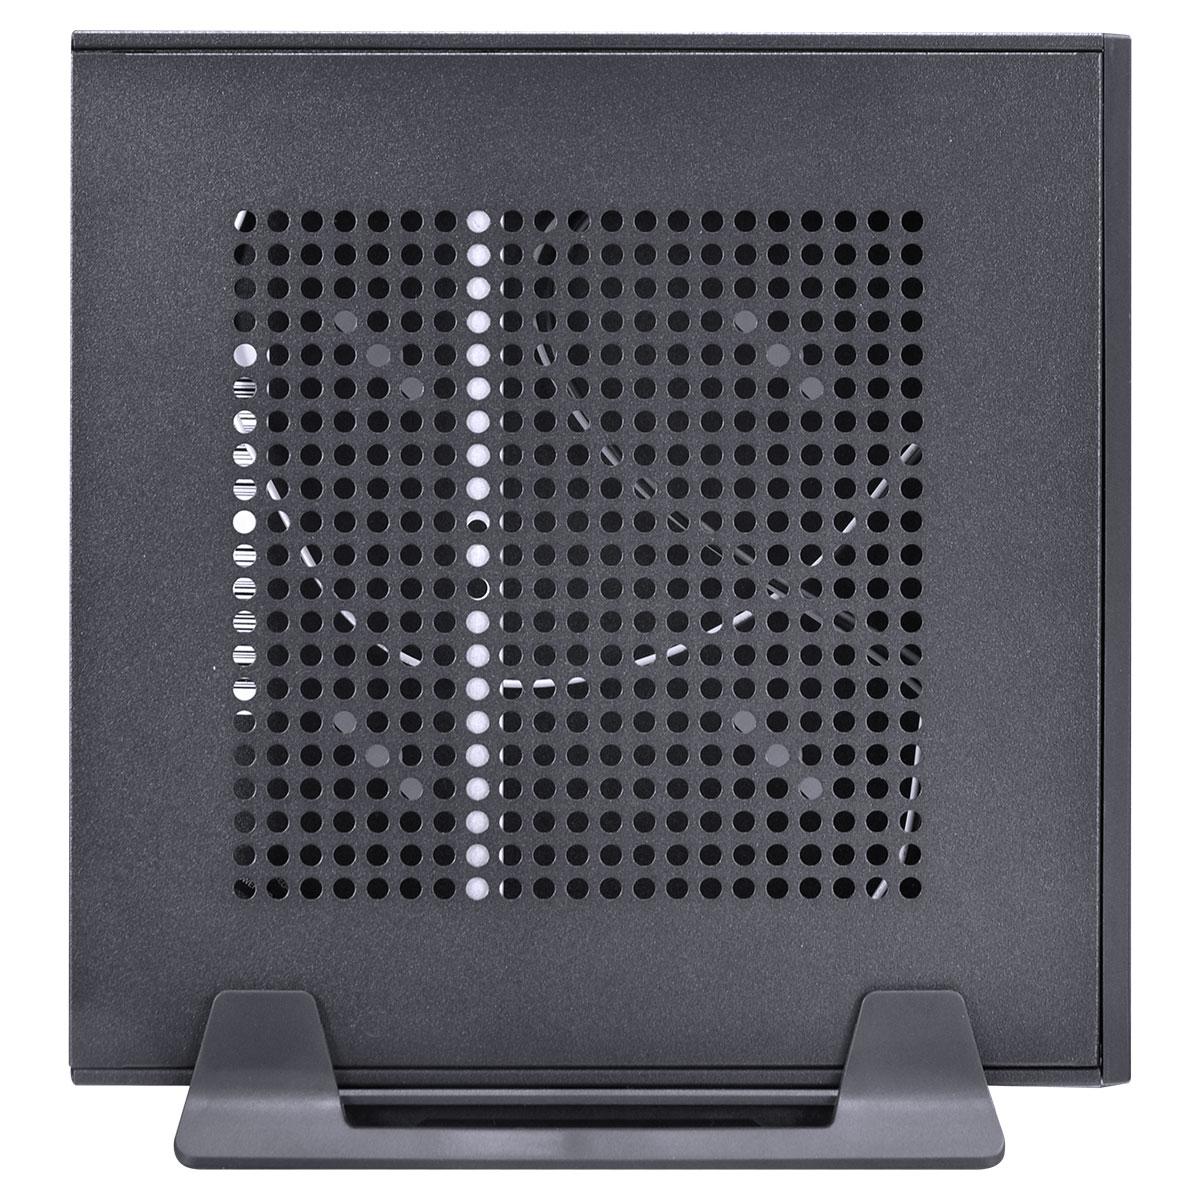 MINI COMPUTADOR BUSINESS B100 - CELERON DUAL CORE J1800 2.41GHZ 4GB DDR3 SODIMM HD 500GB HDMI/VGA FONTE EXT. 60W